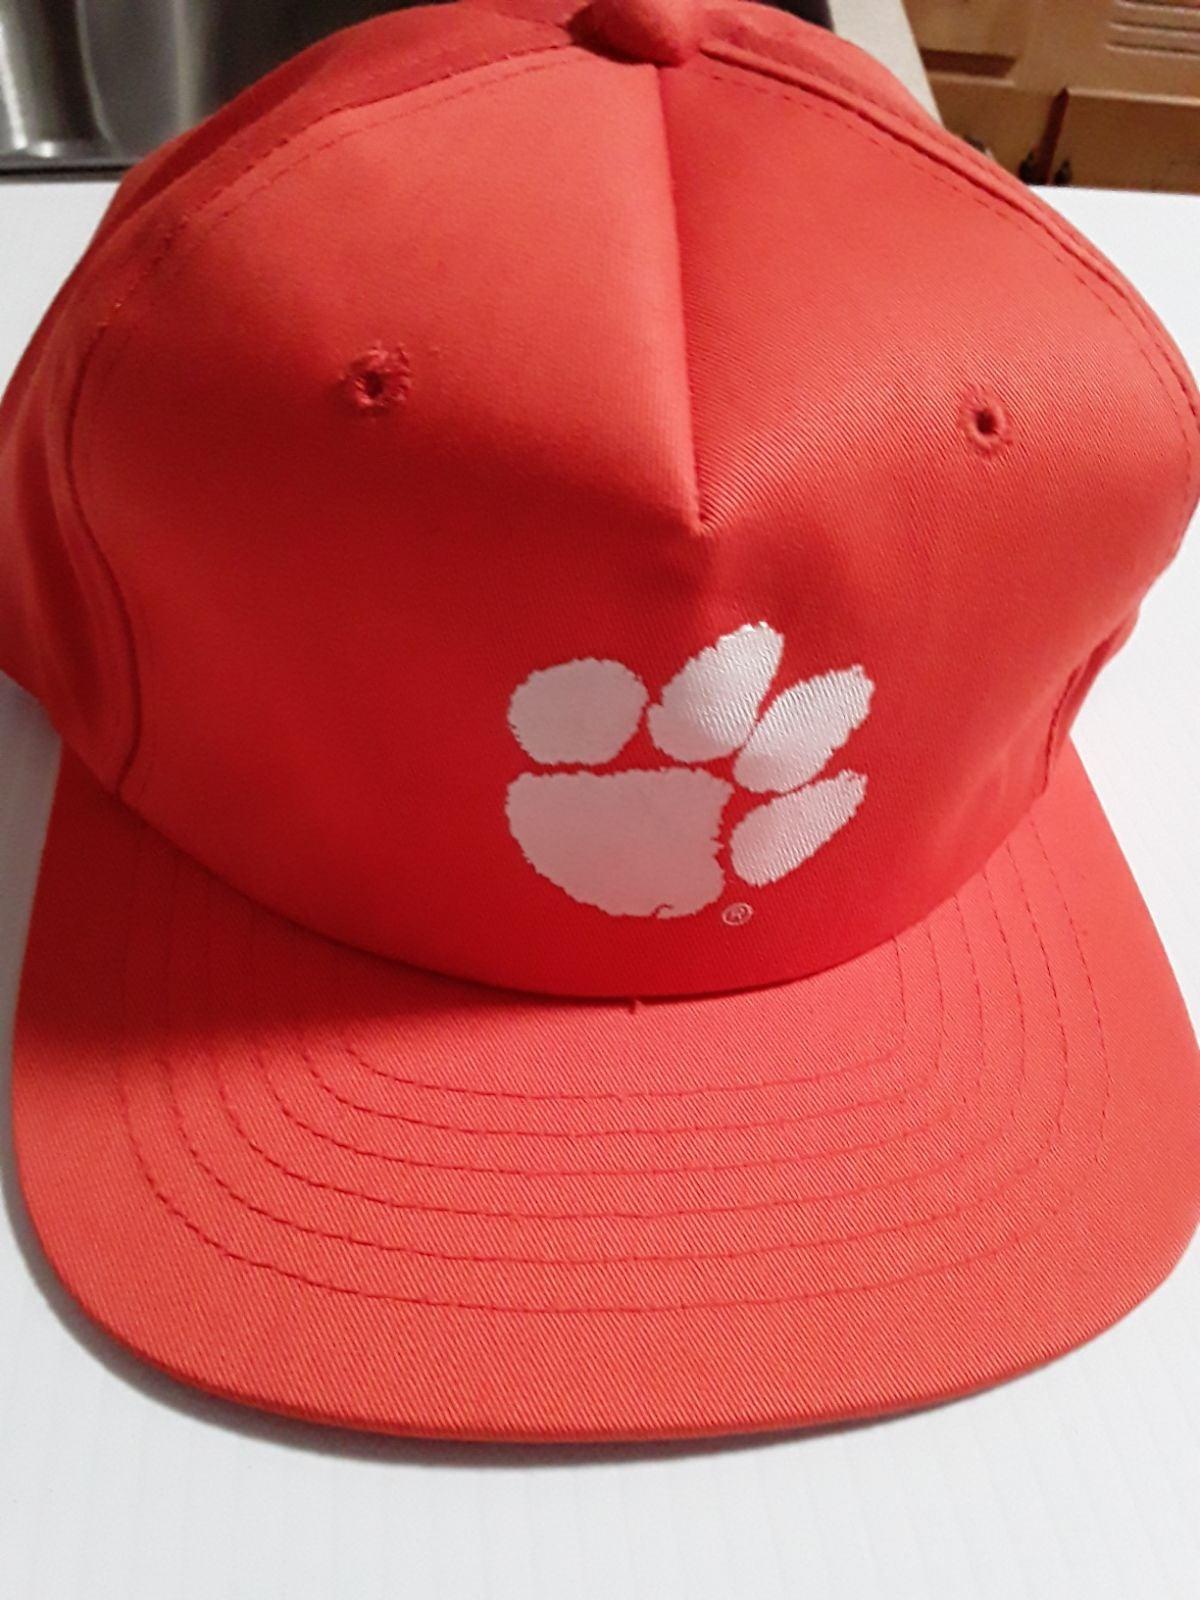 Clemson Tigers cap